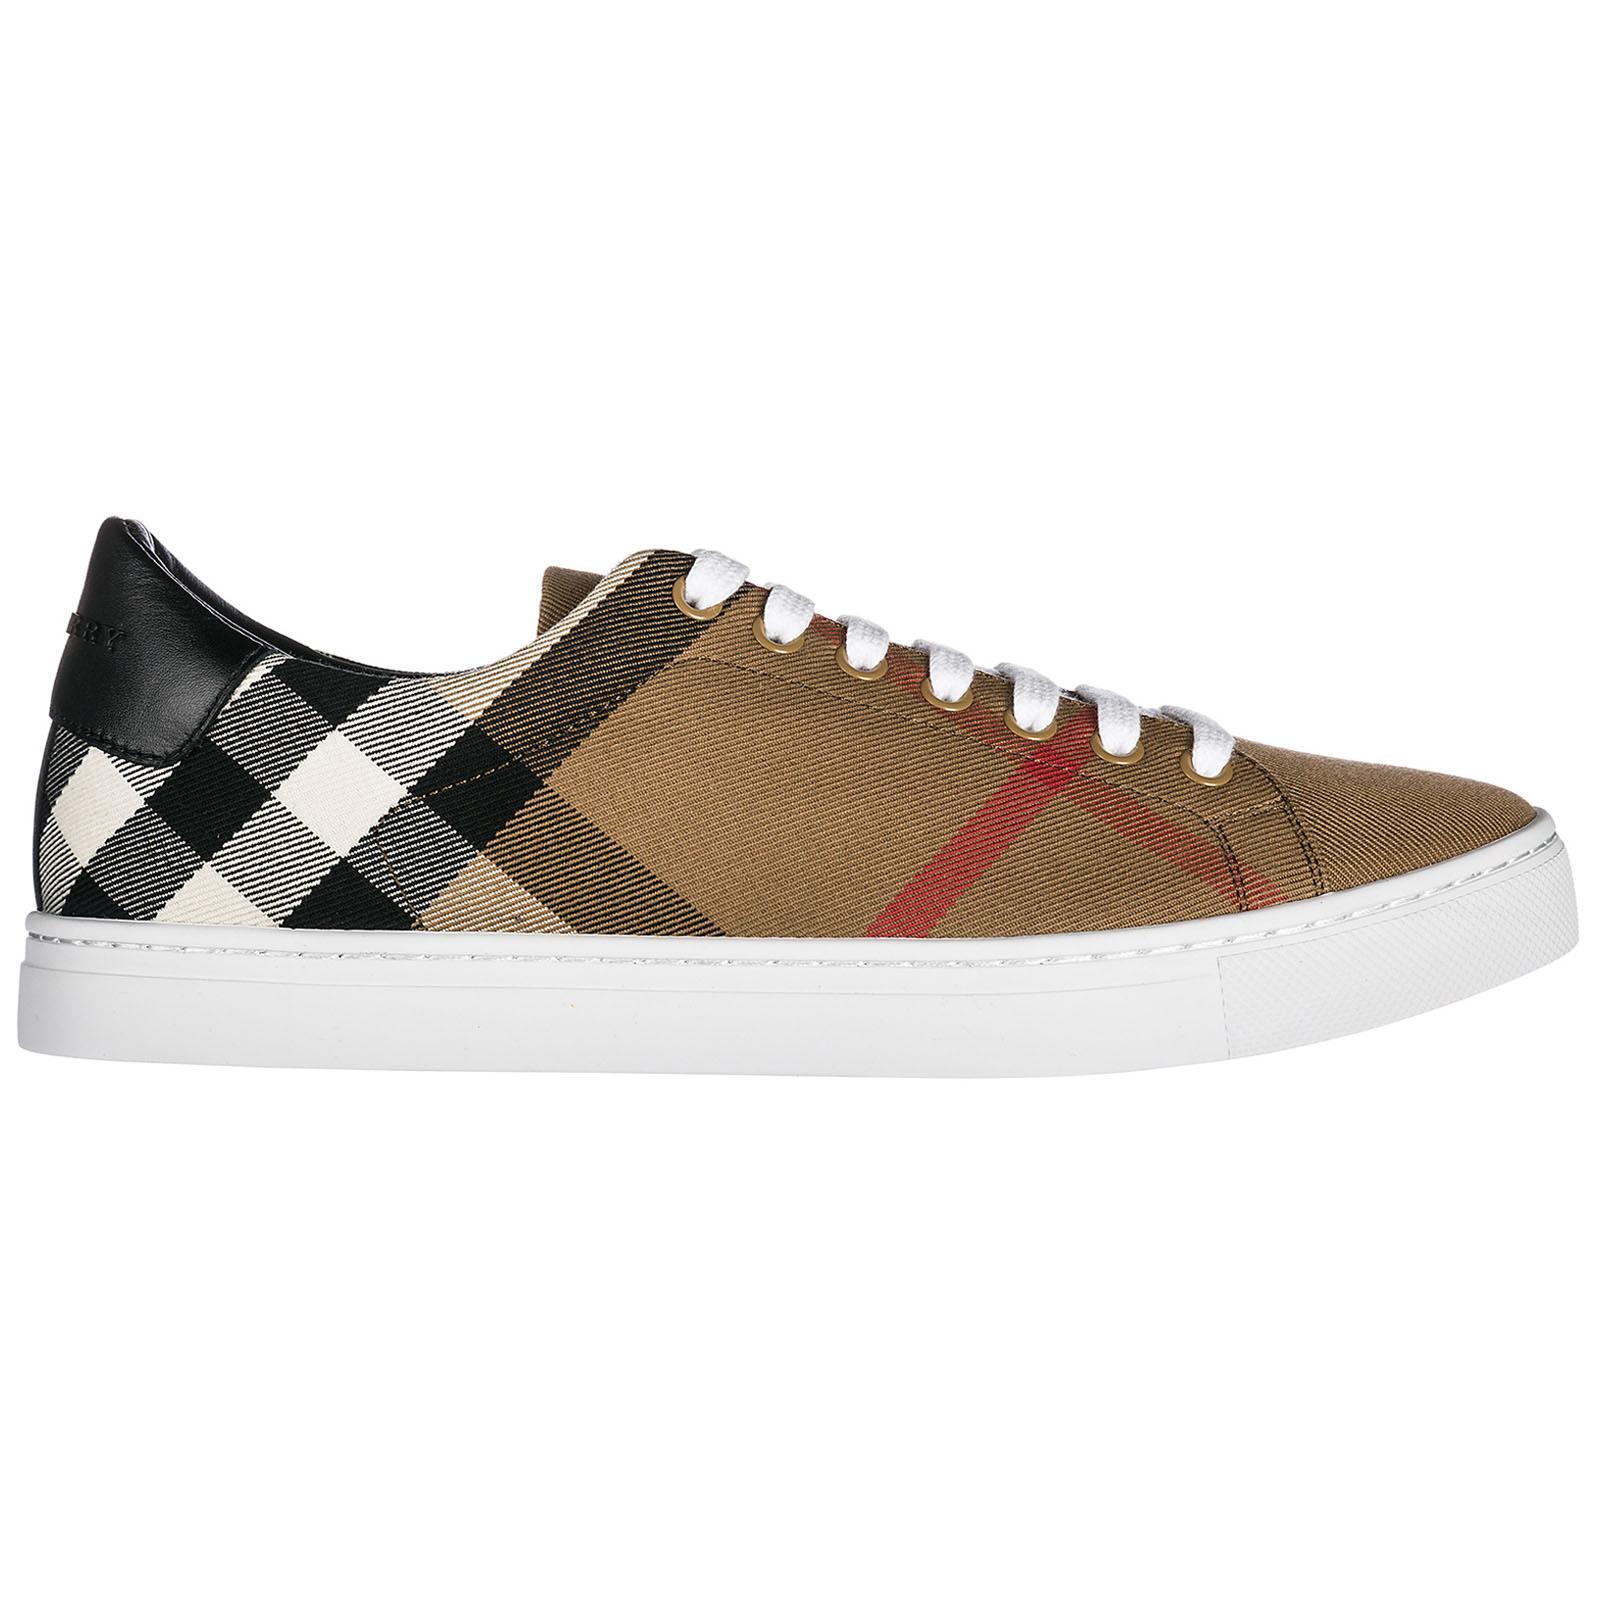 Sneakers Burberry Albert 40540371 marrone  96433e45517